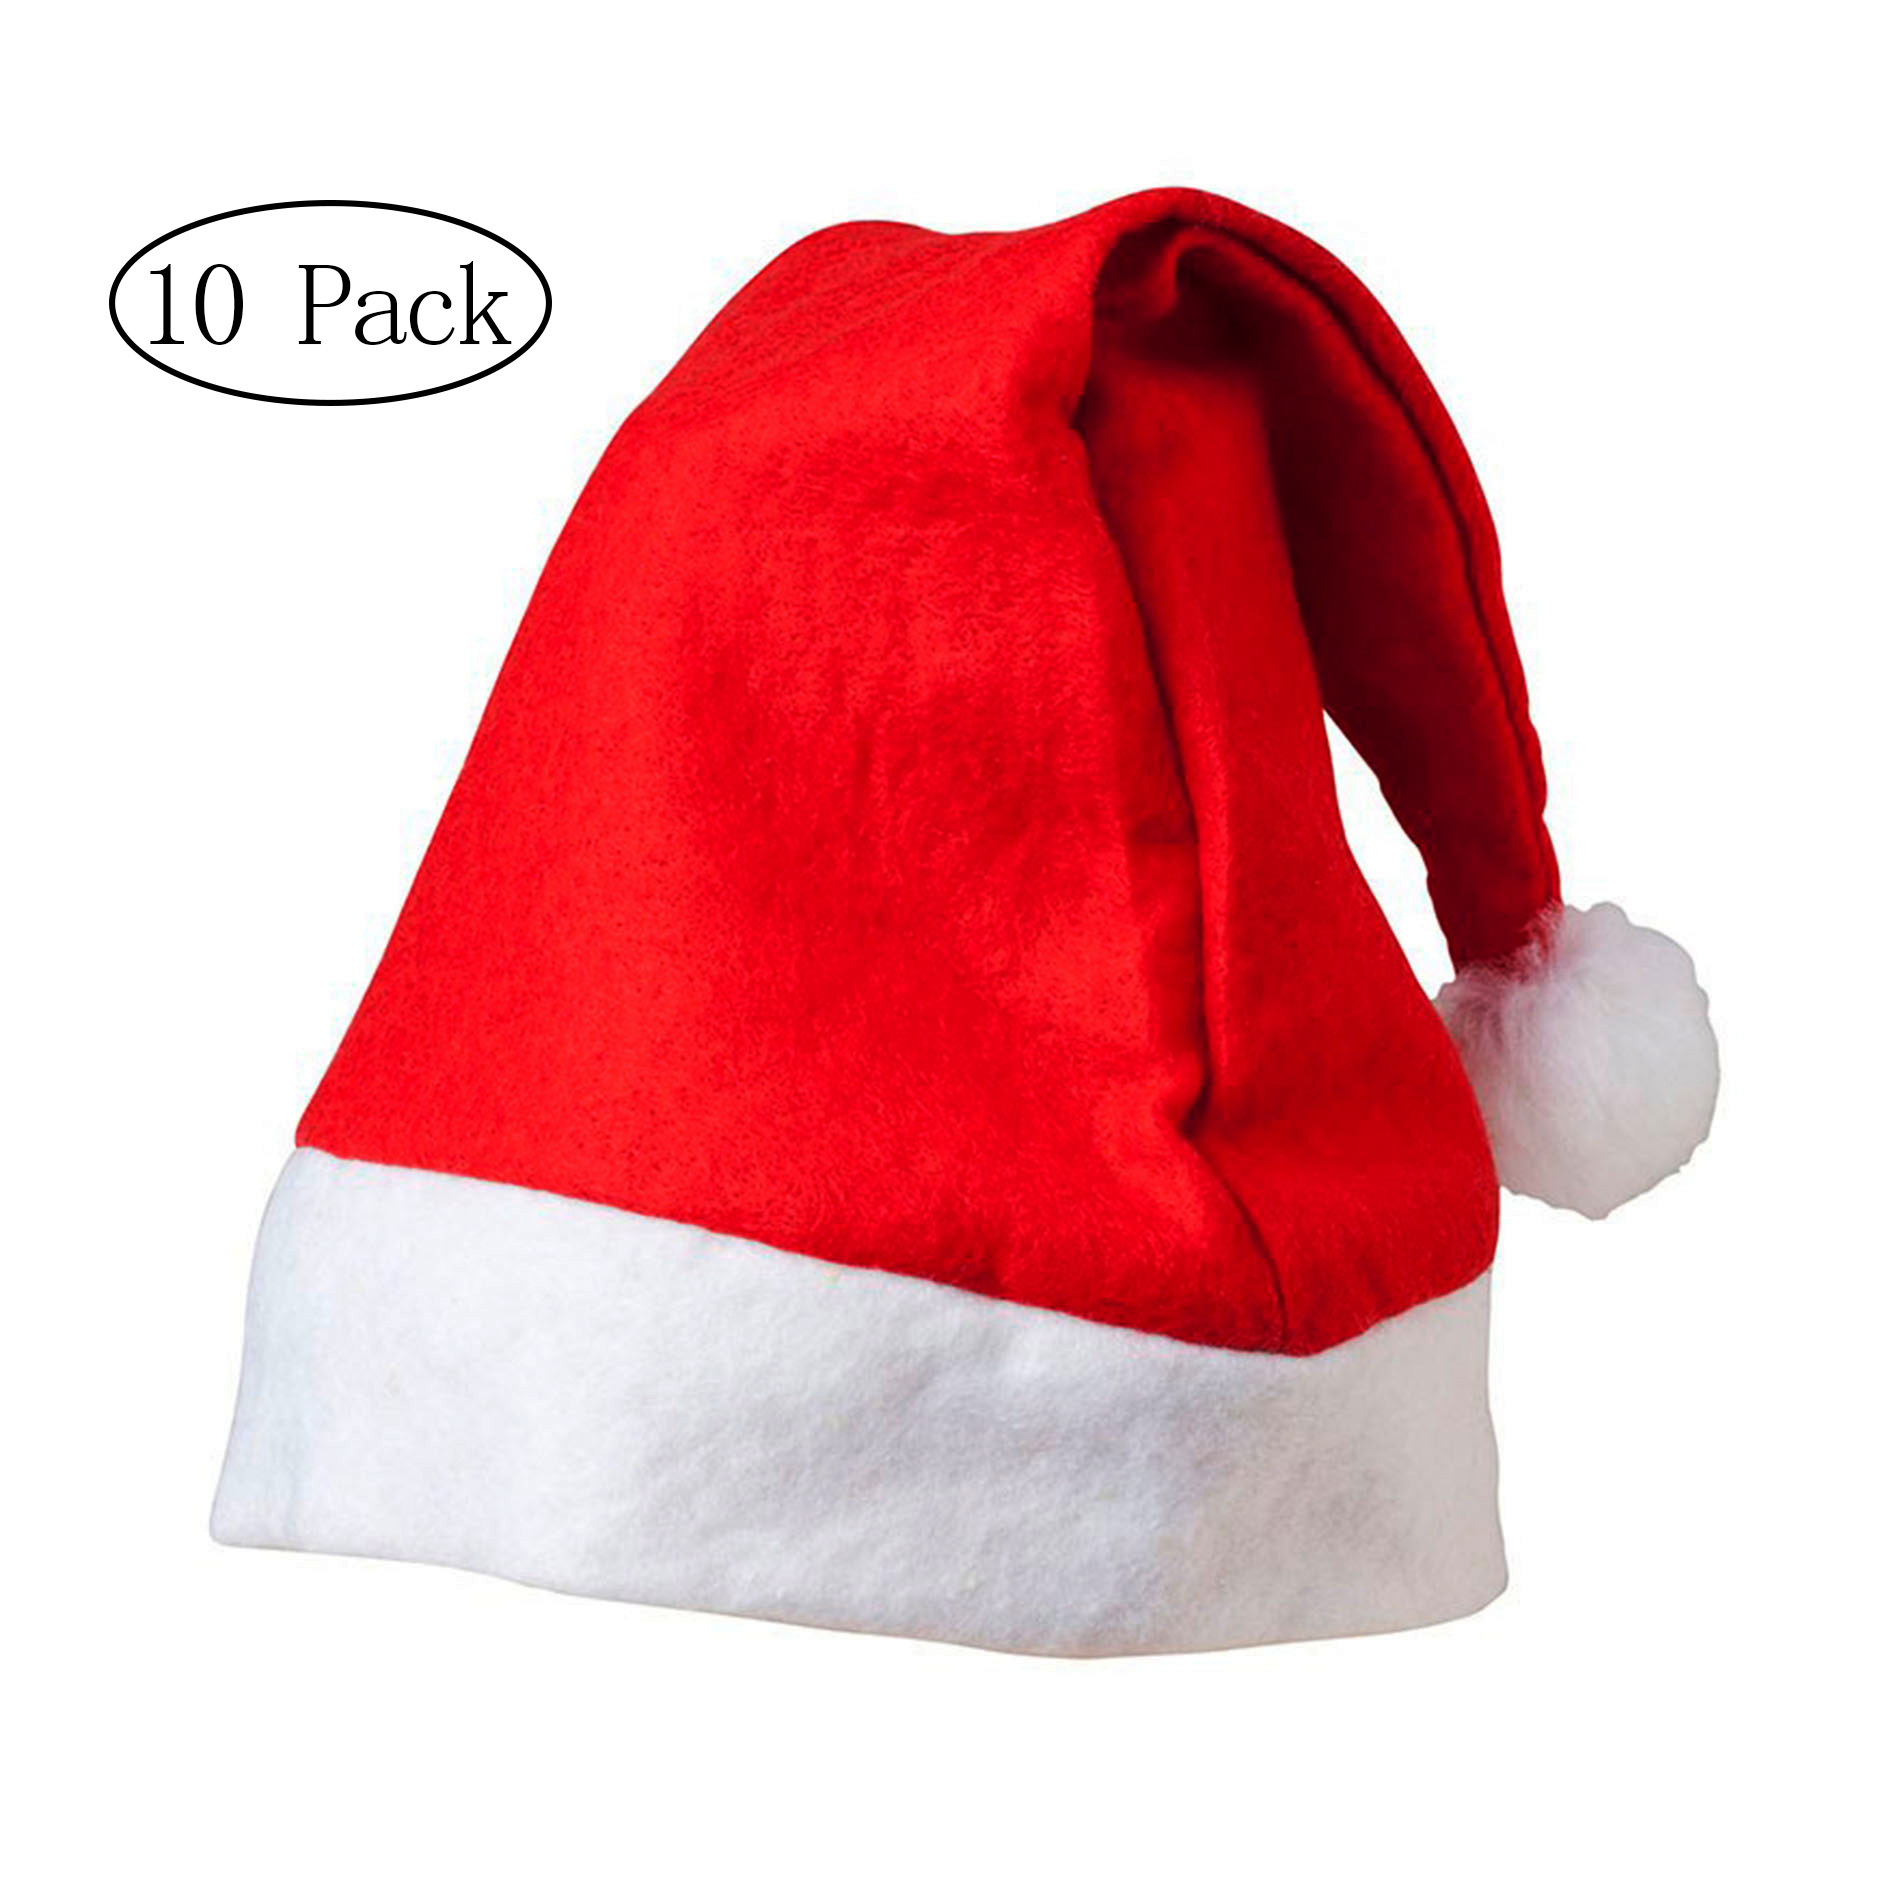 Budget Santa Hats Wholesale Adult Fancy Dress Party Novelty Costume Felt Hats